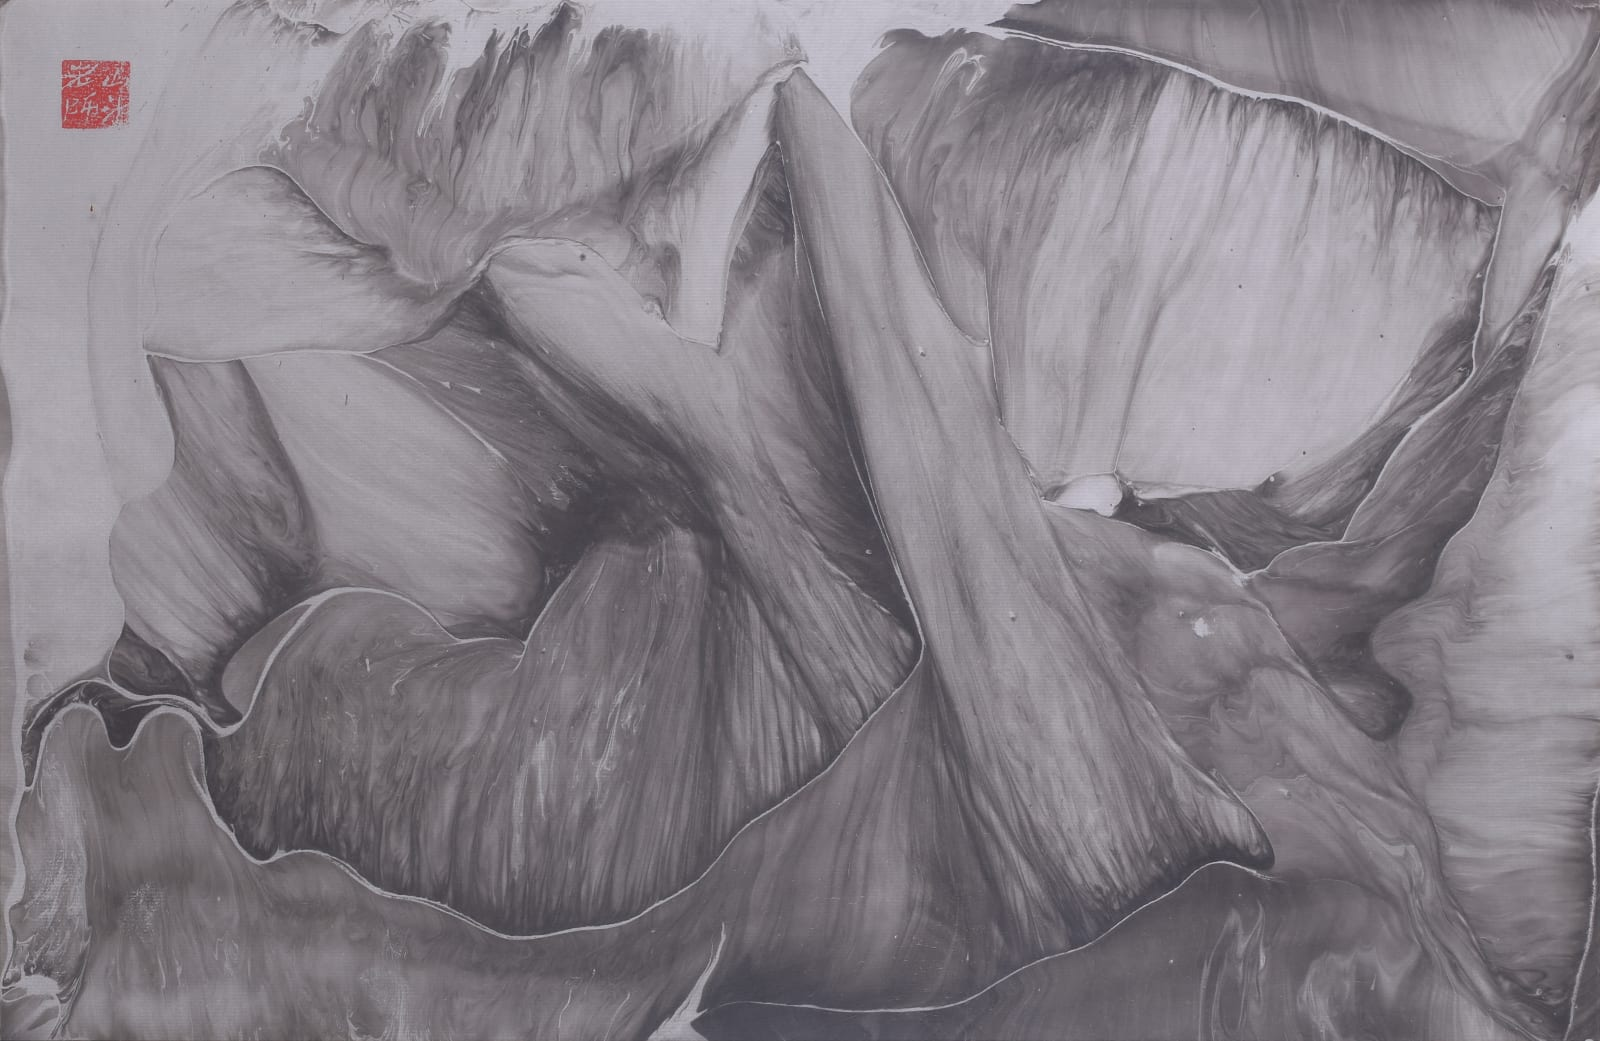 Wesley Tongson 唐家偉, Untitled 無題 No. 368, 1997